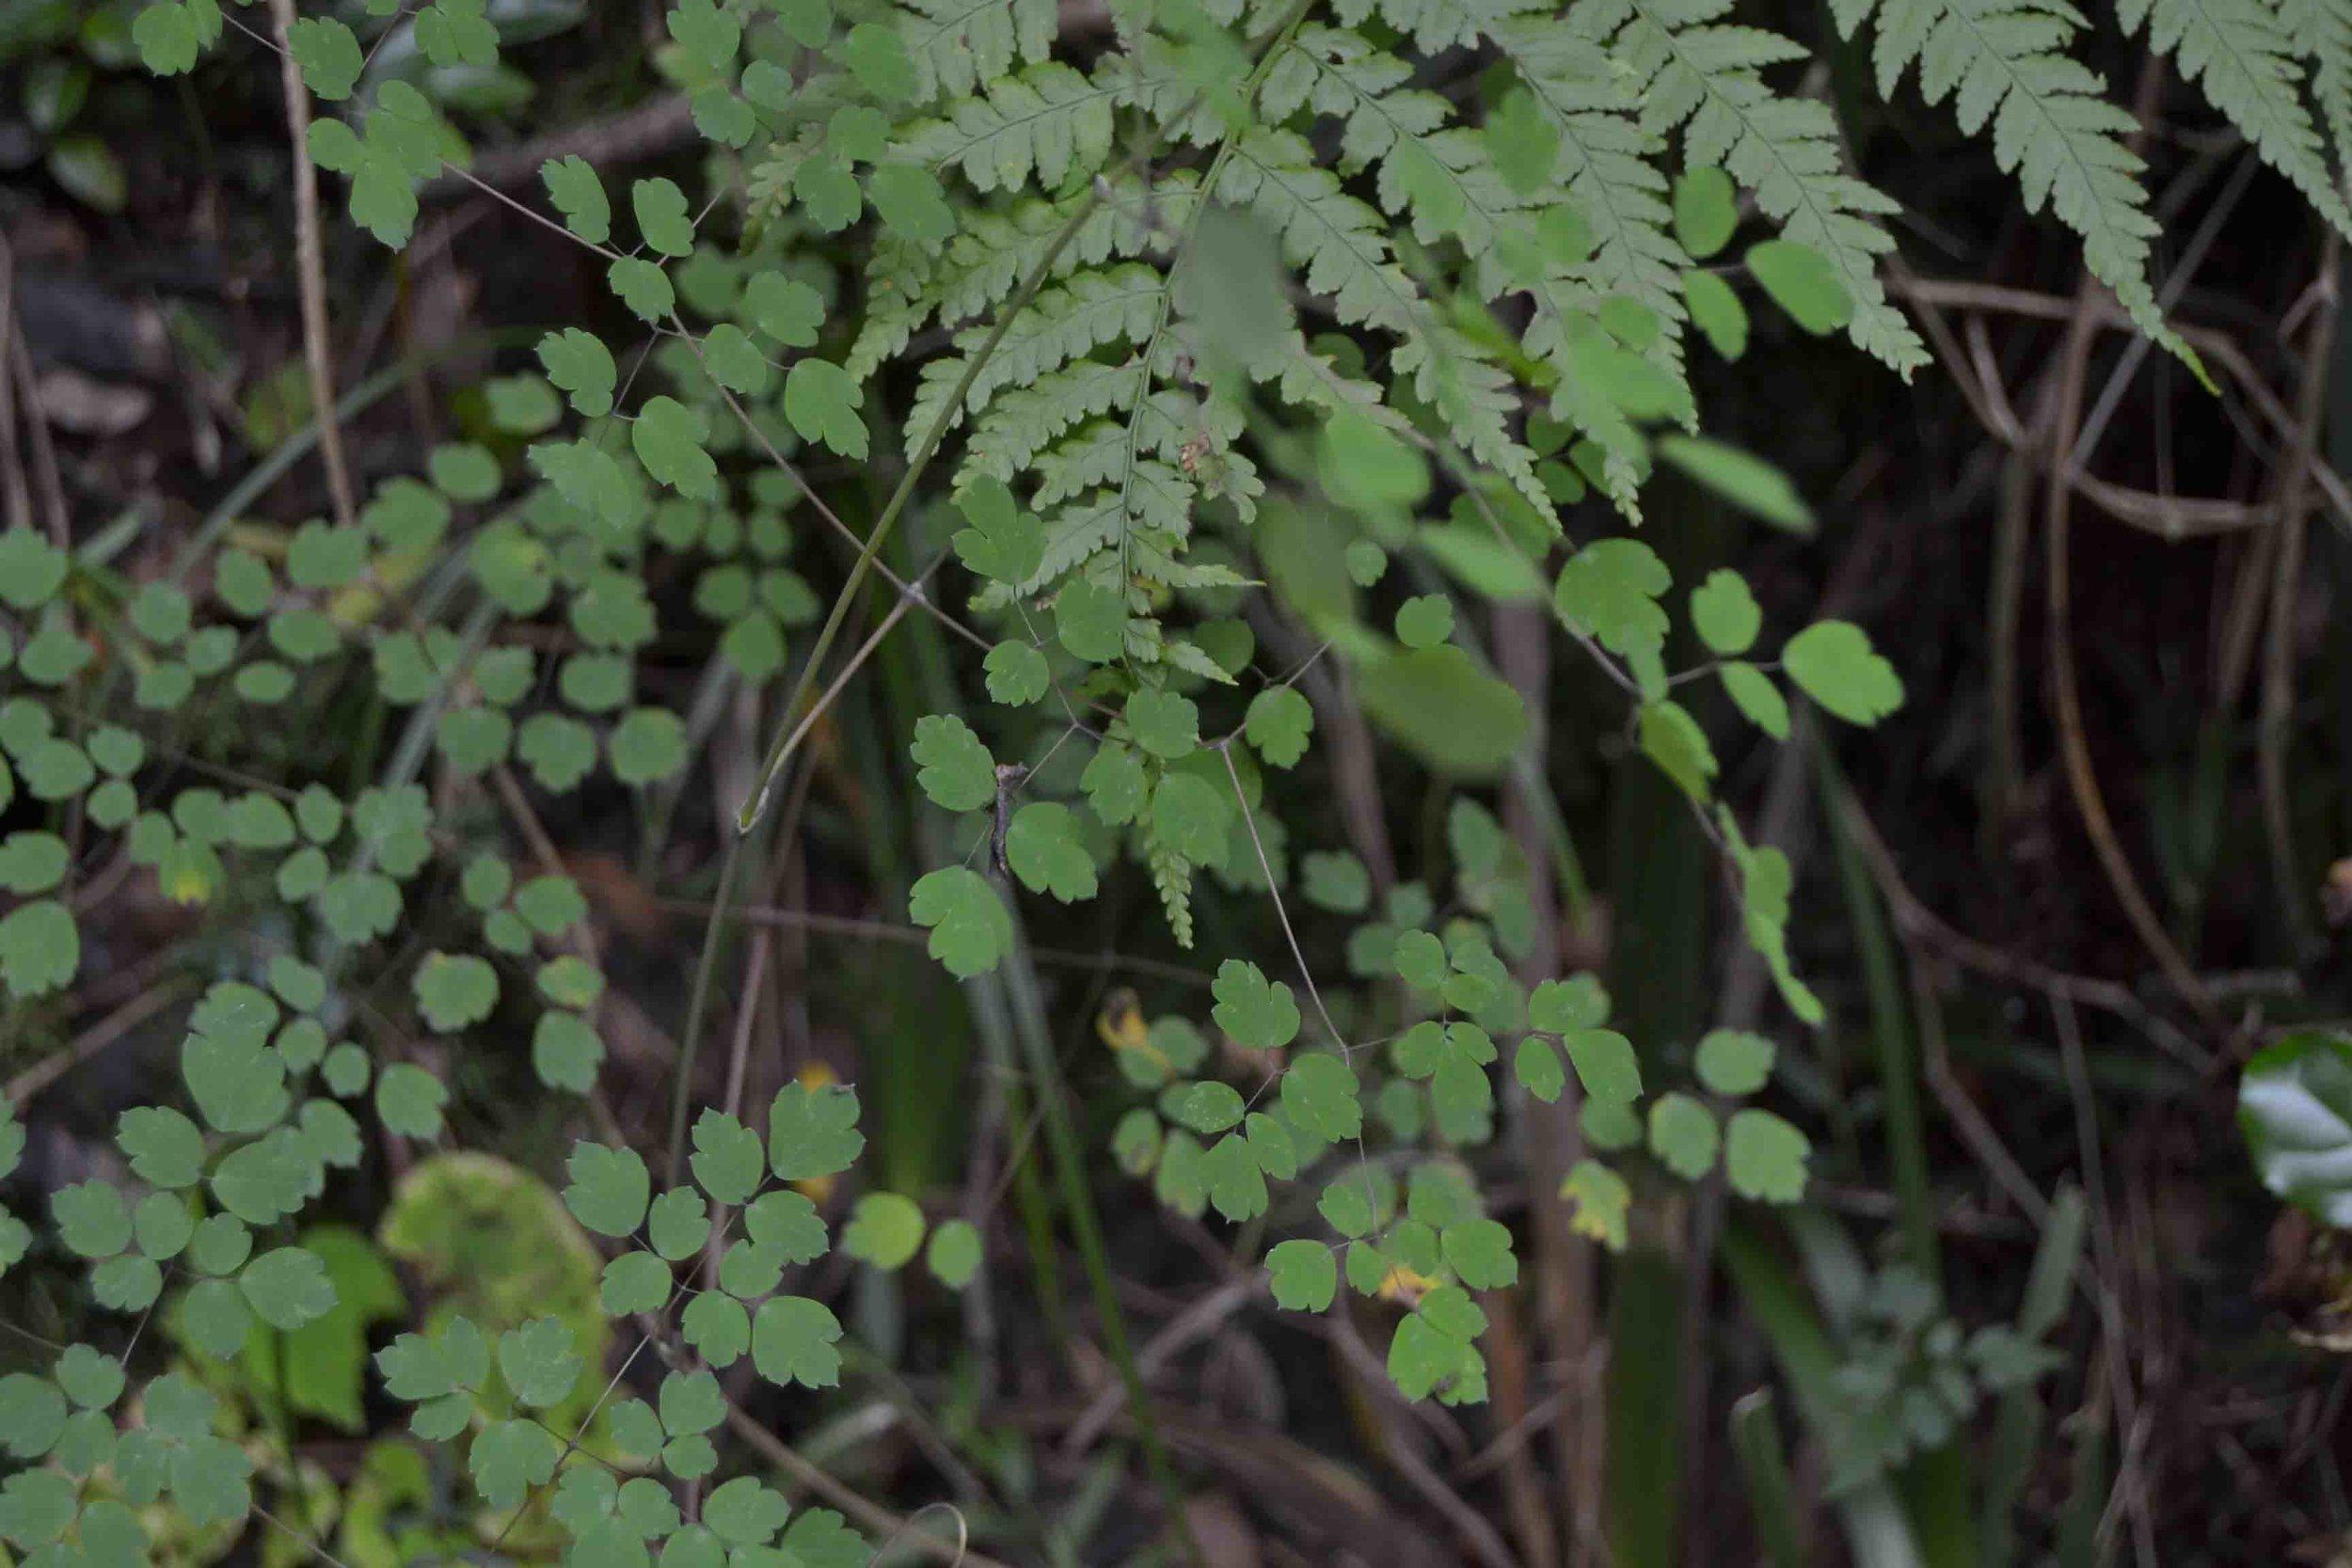 Thalictrum rhynchocarpum - soft and delicate foliage for shady areas